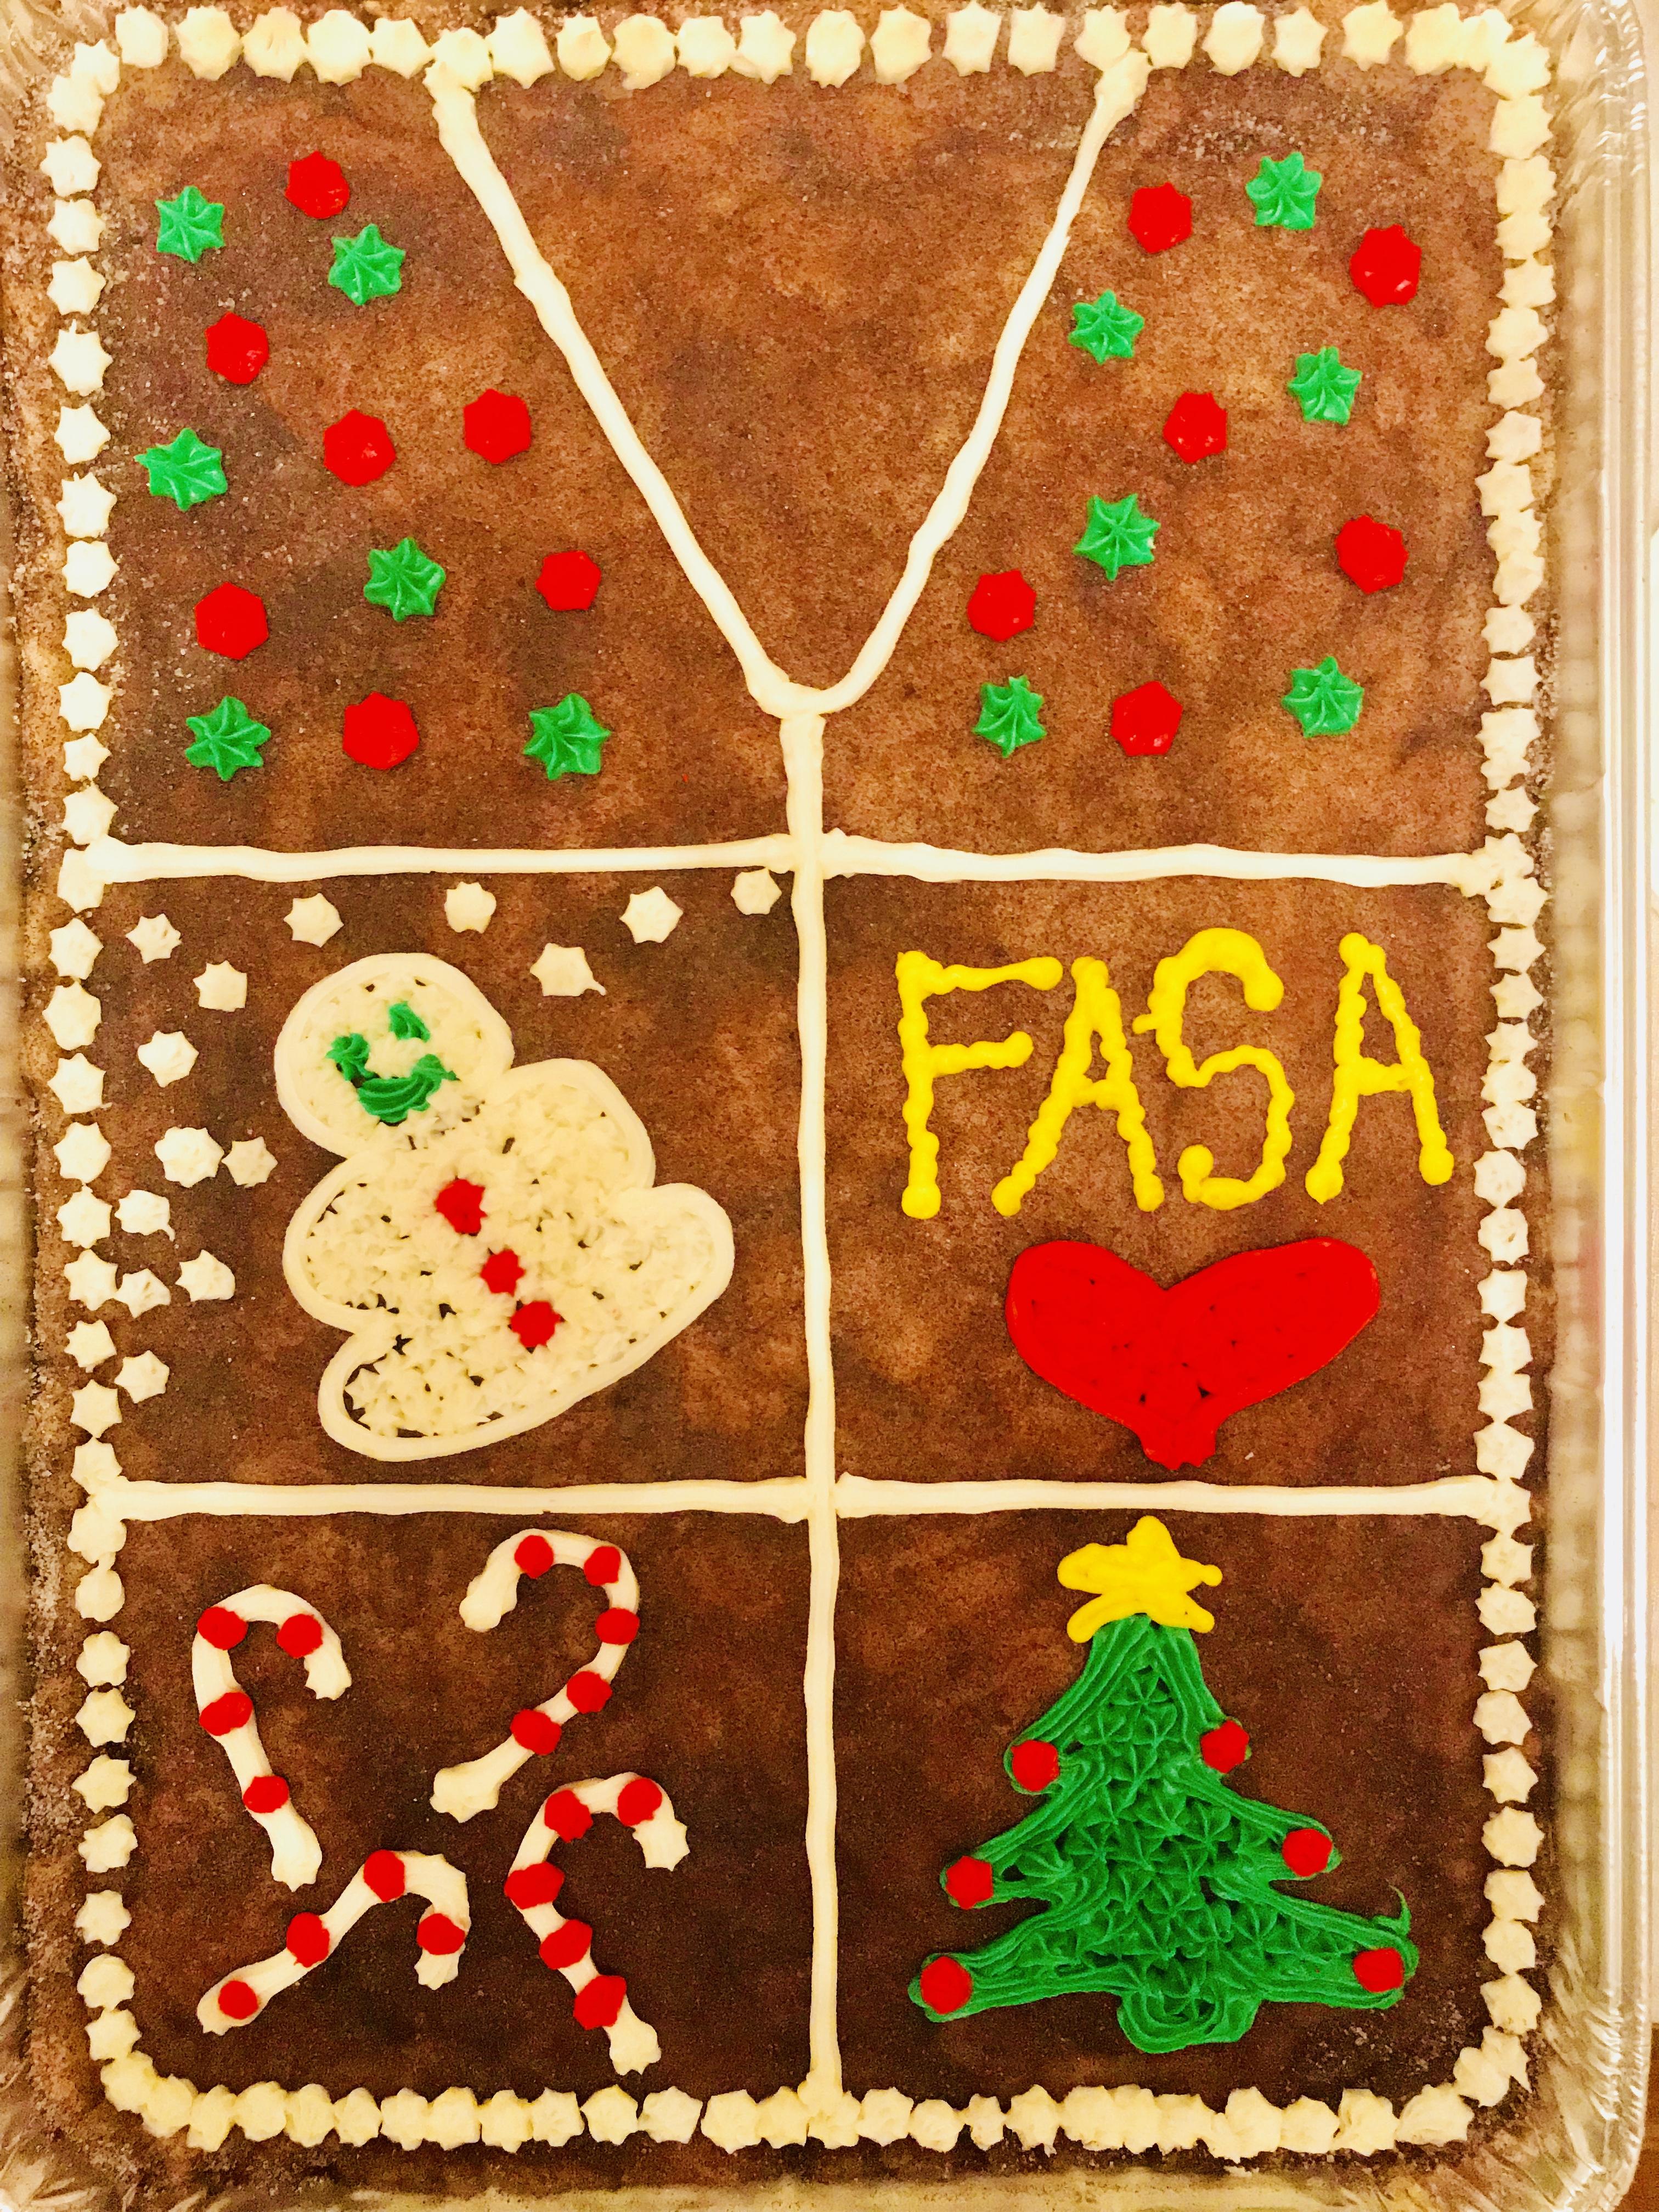 https://0201.nccdn.net/1_2/000/000/14b/789/fasa_Christmas.jpg